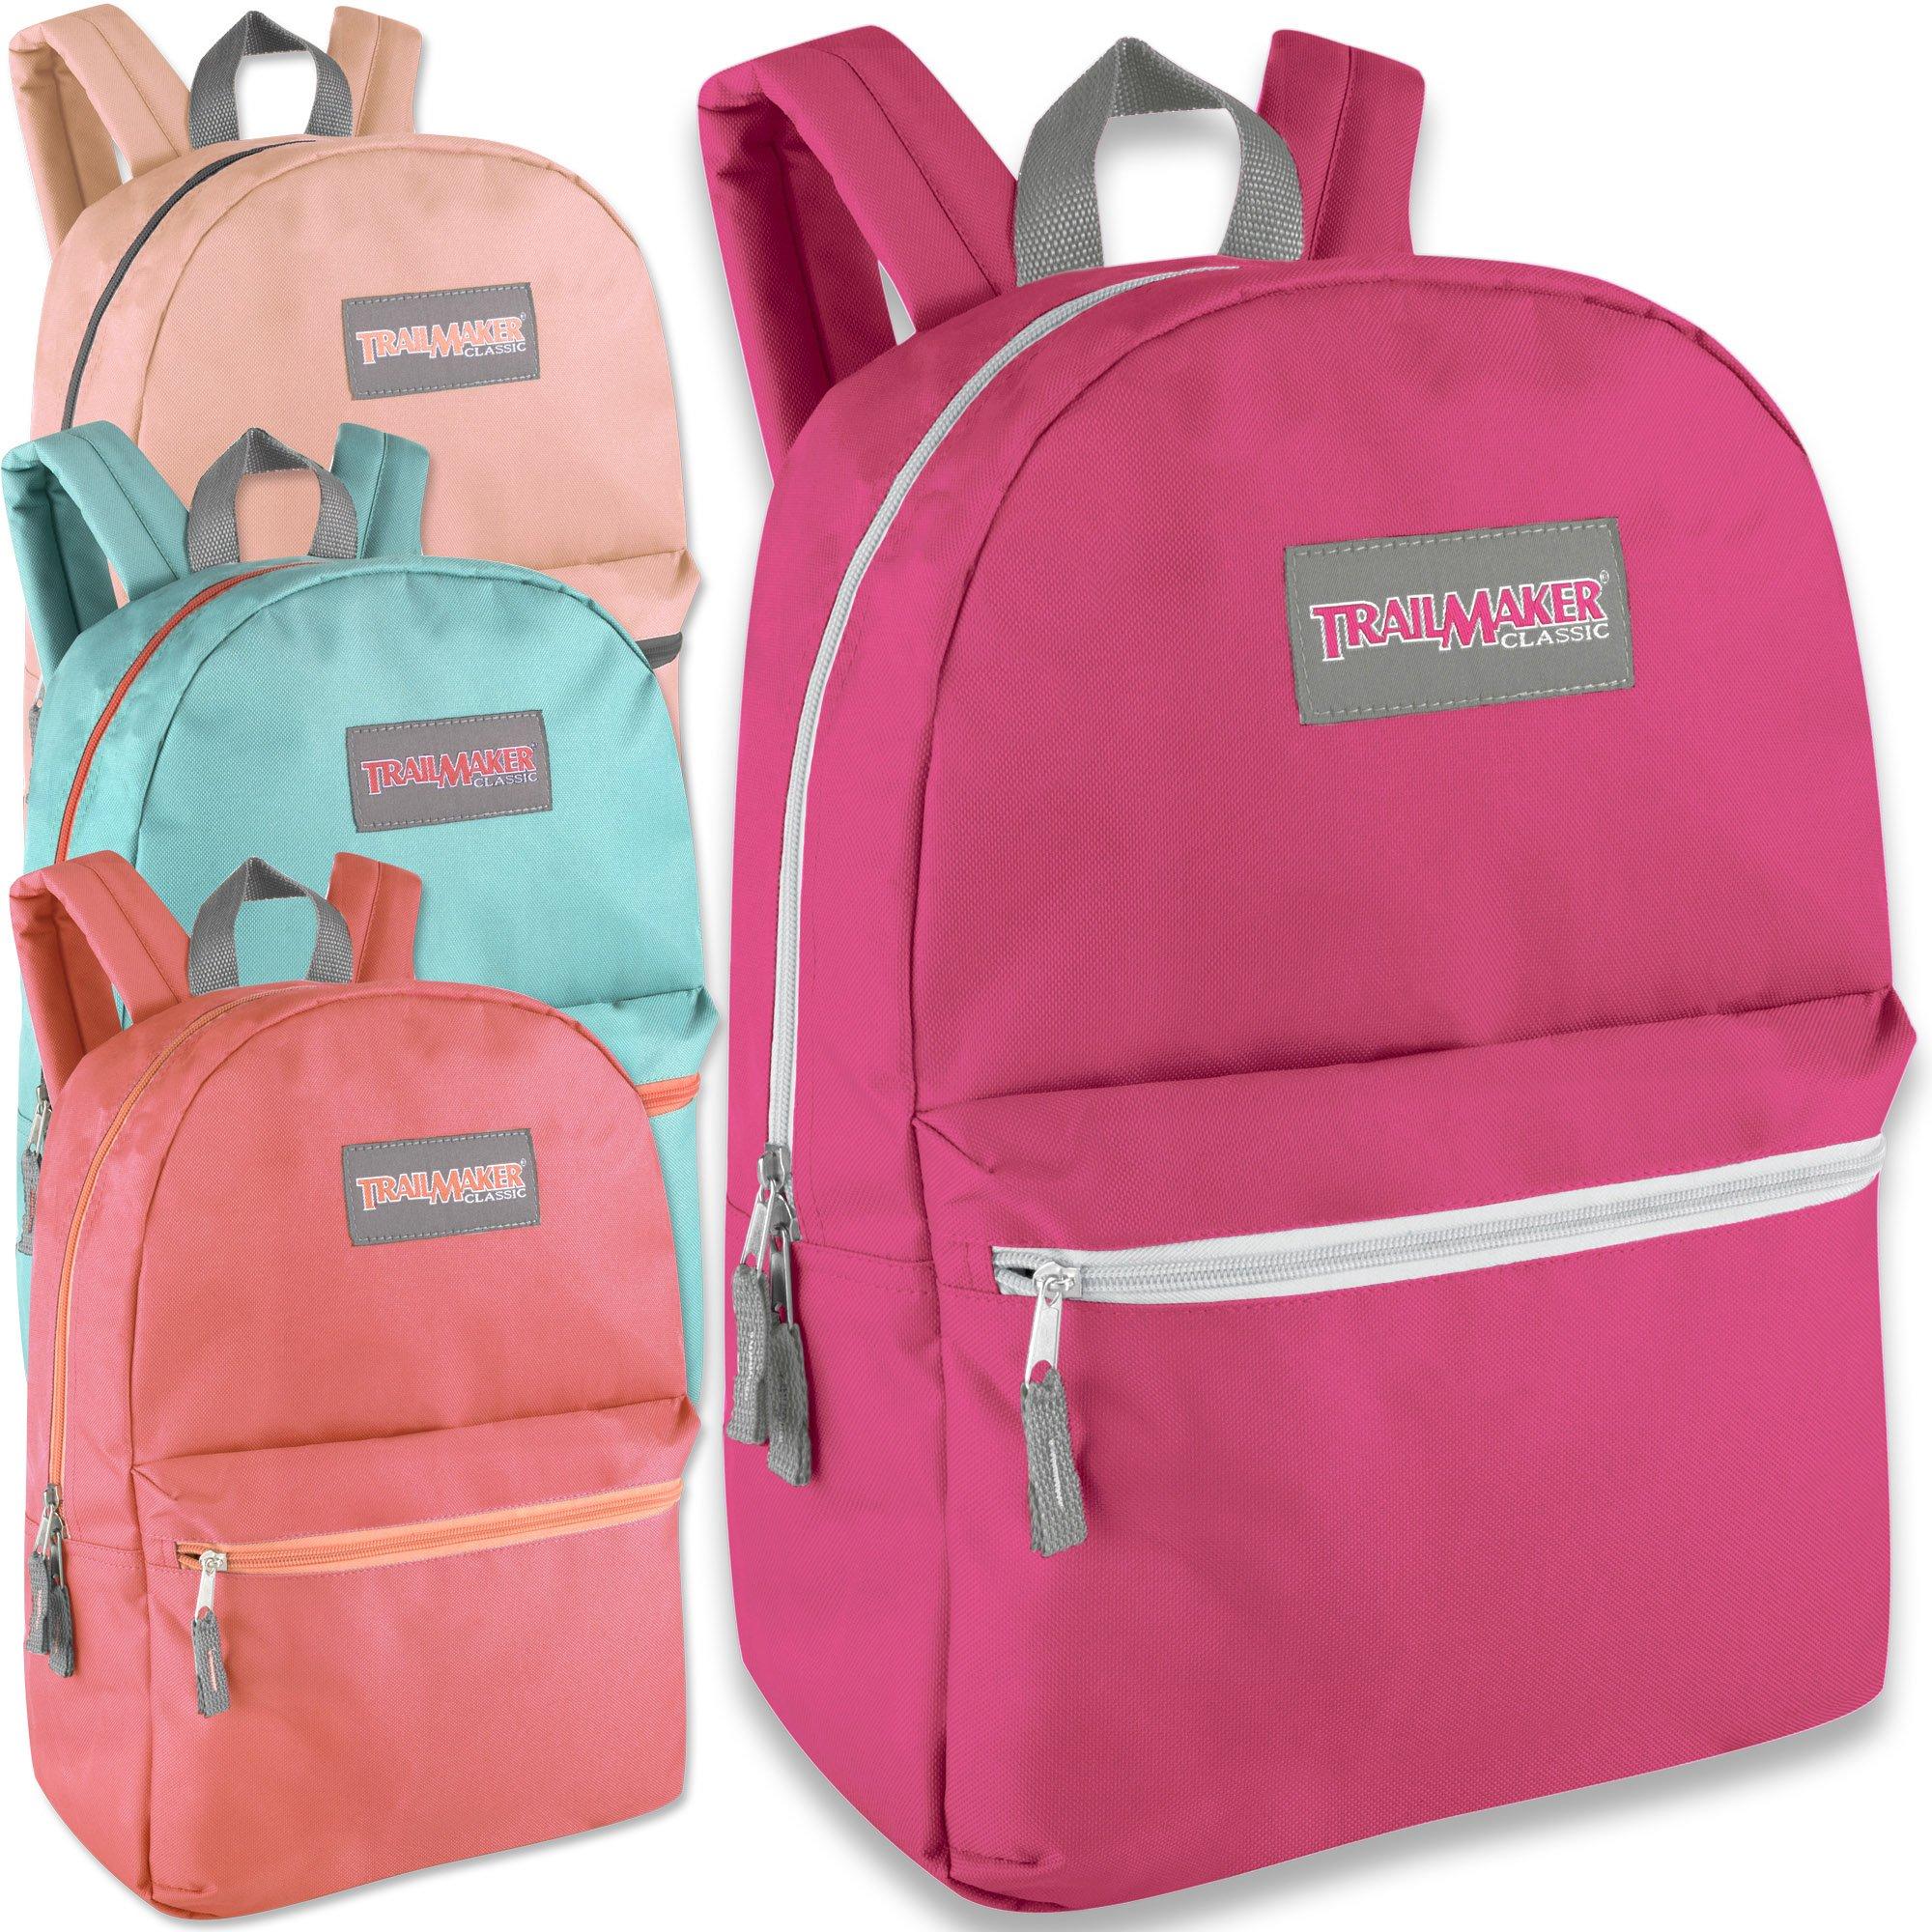 Wholesale Trailmaker Deluxe 17 Inch Backpack - Girls Case Pack 24